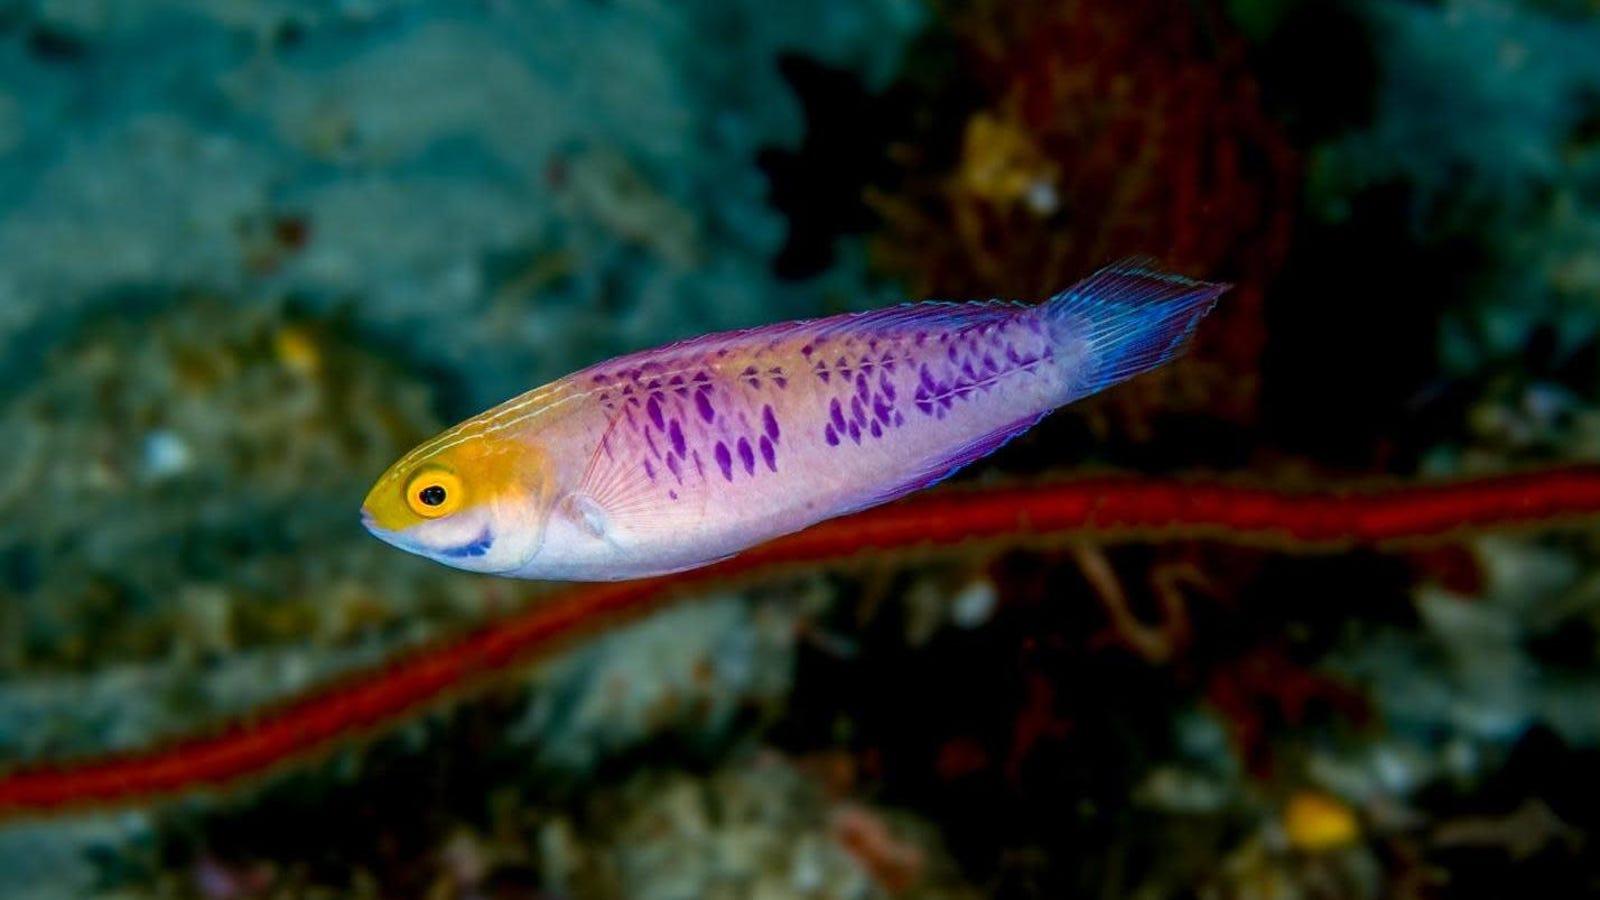 Newly-Discovered 'Vibranium' Fish Named in Honor of Wakanda